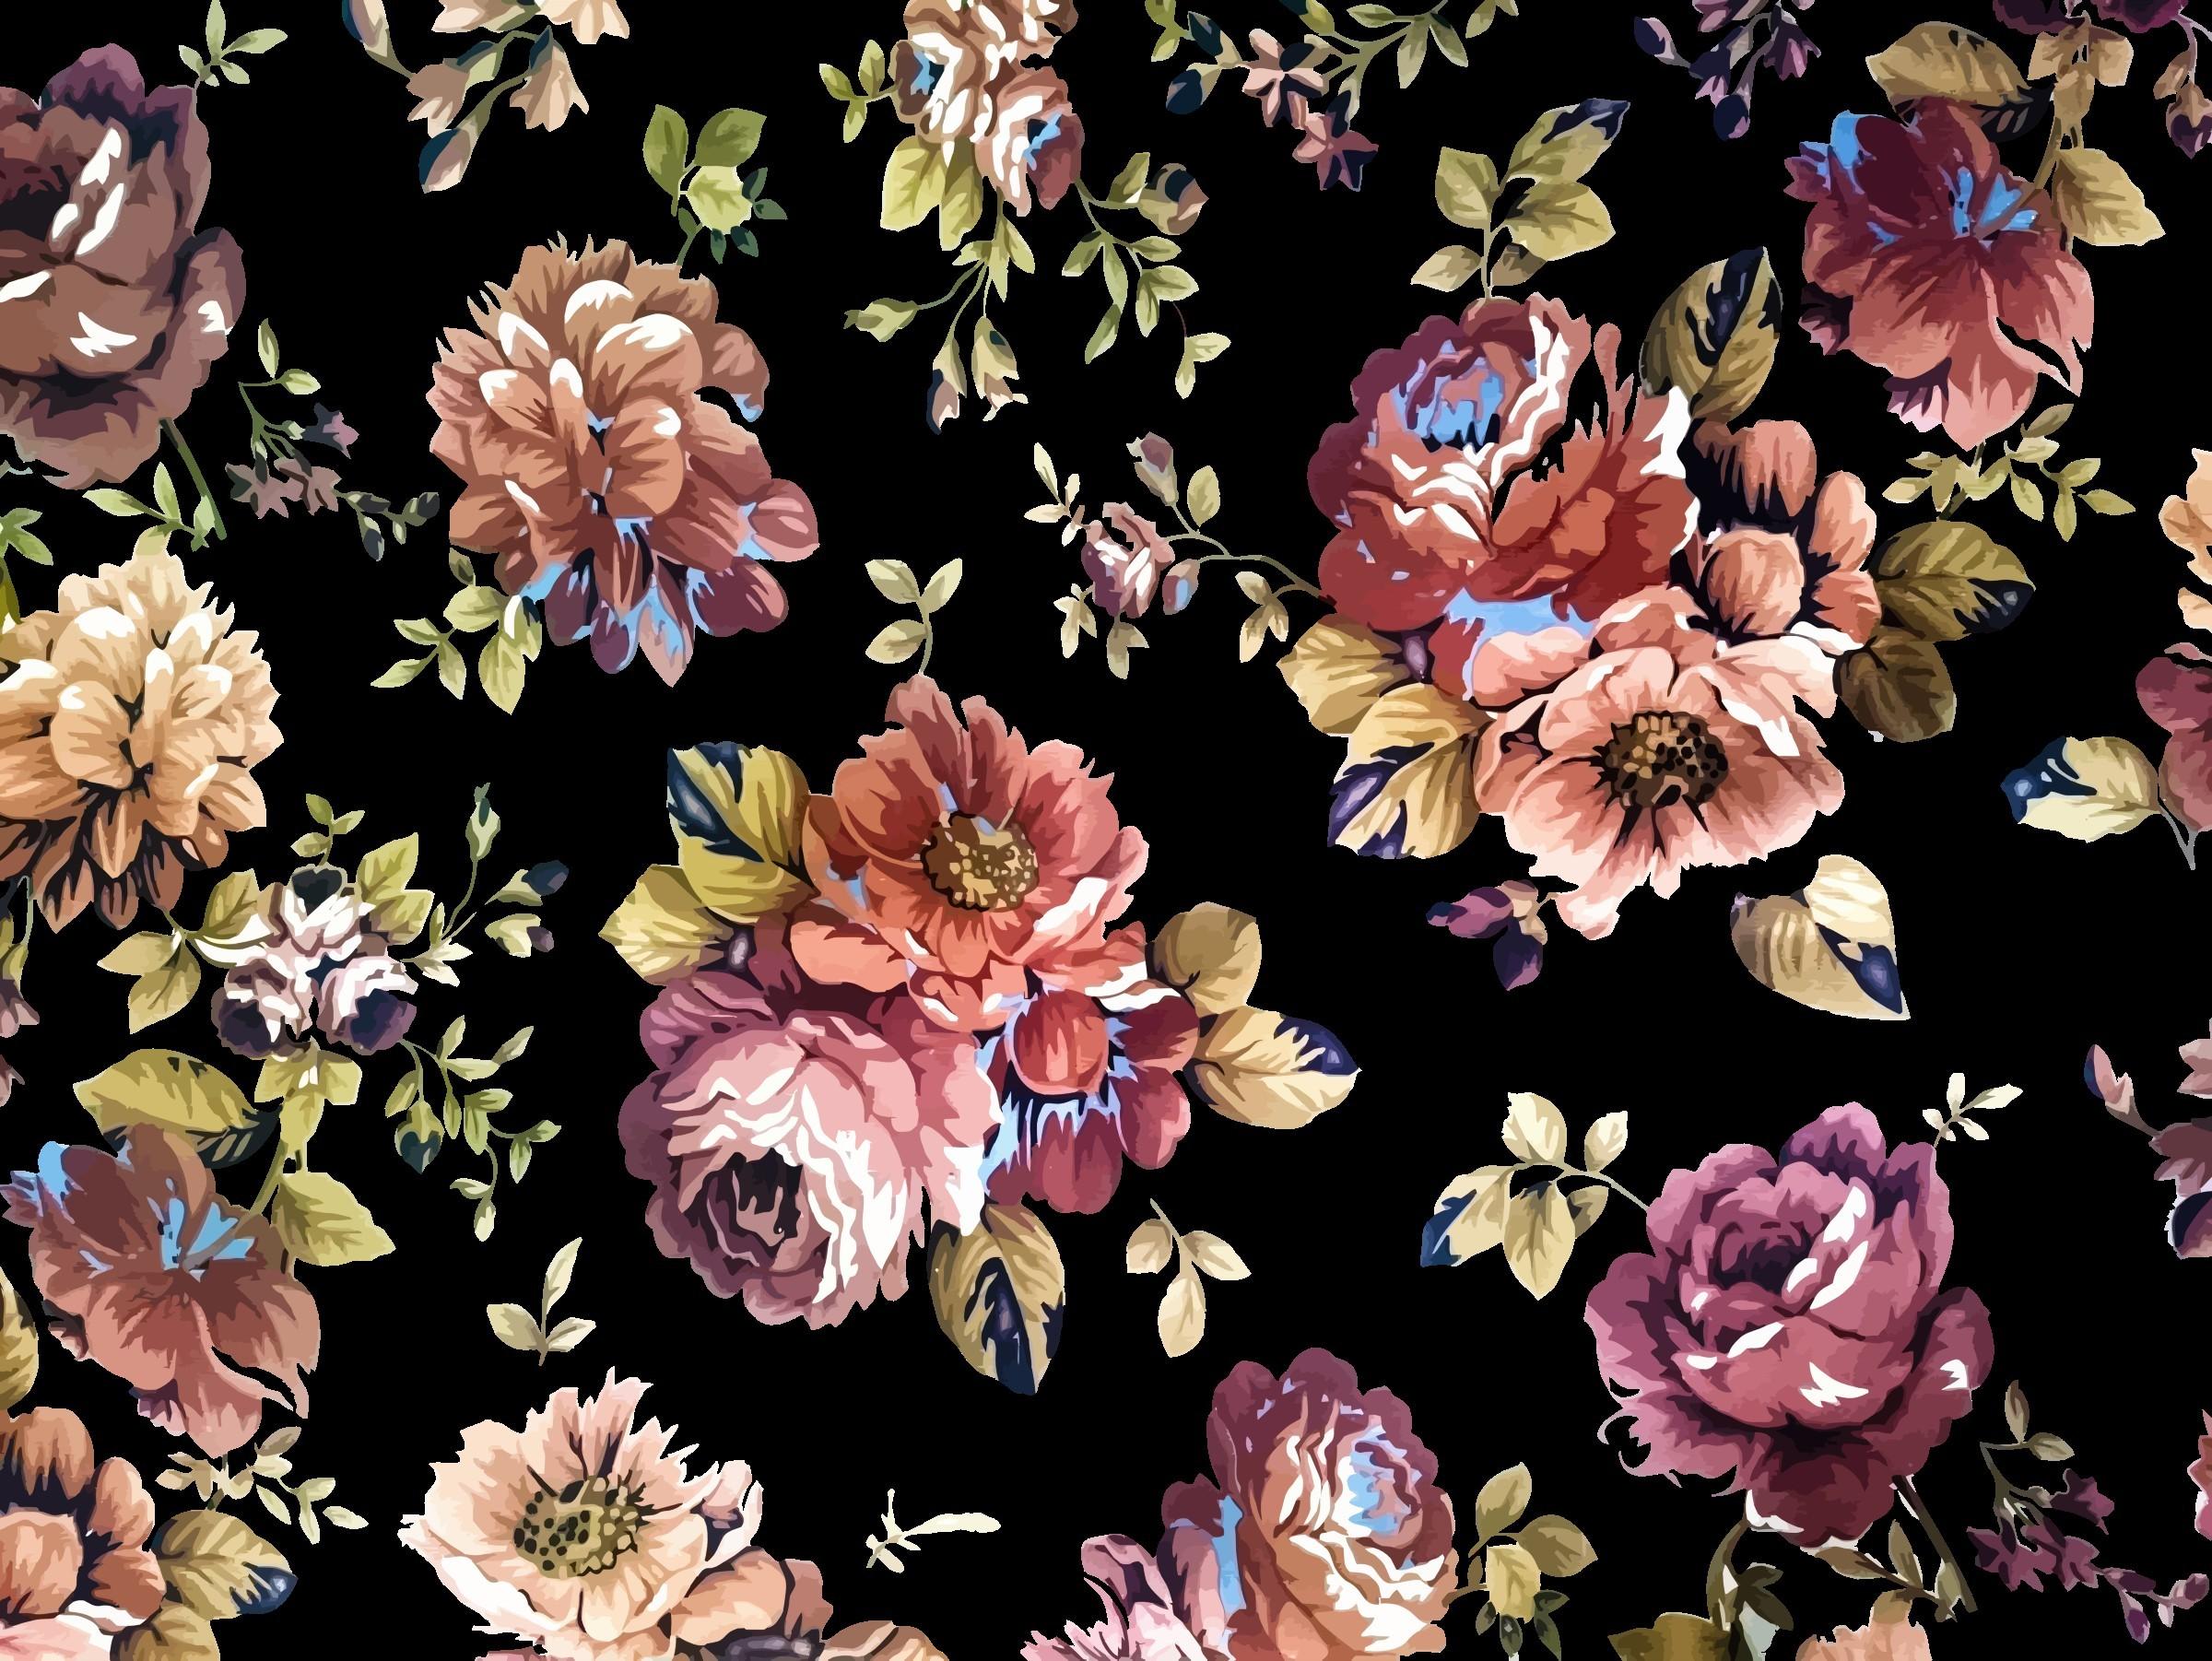 Vintage Flower Backgrounds (49+ pictures)